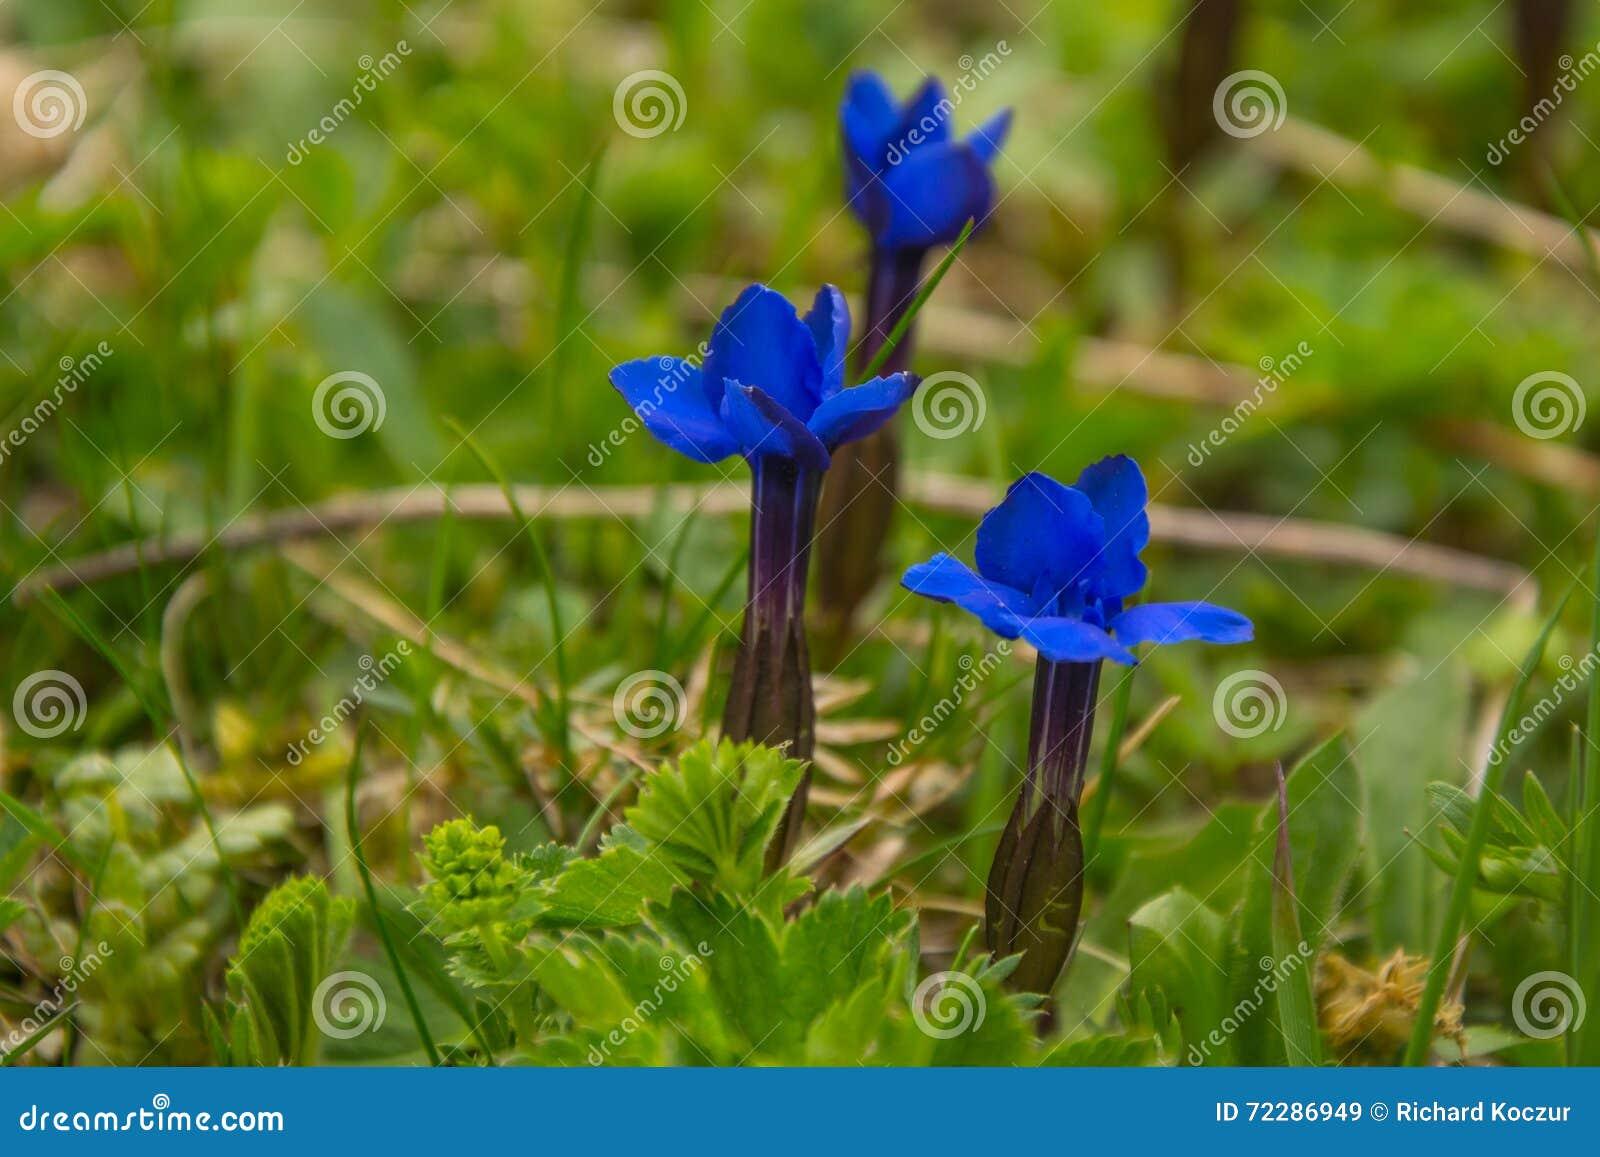 Blue alpine flowers gentiana bavarica stock image image of petal blue alpine flowers gentiana bavarica izmirmasajfo